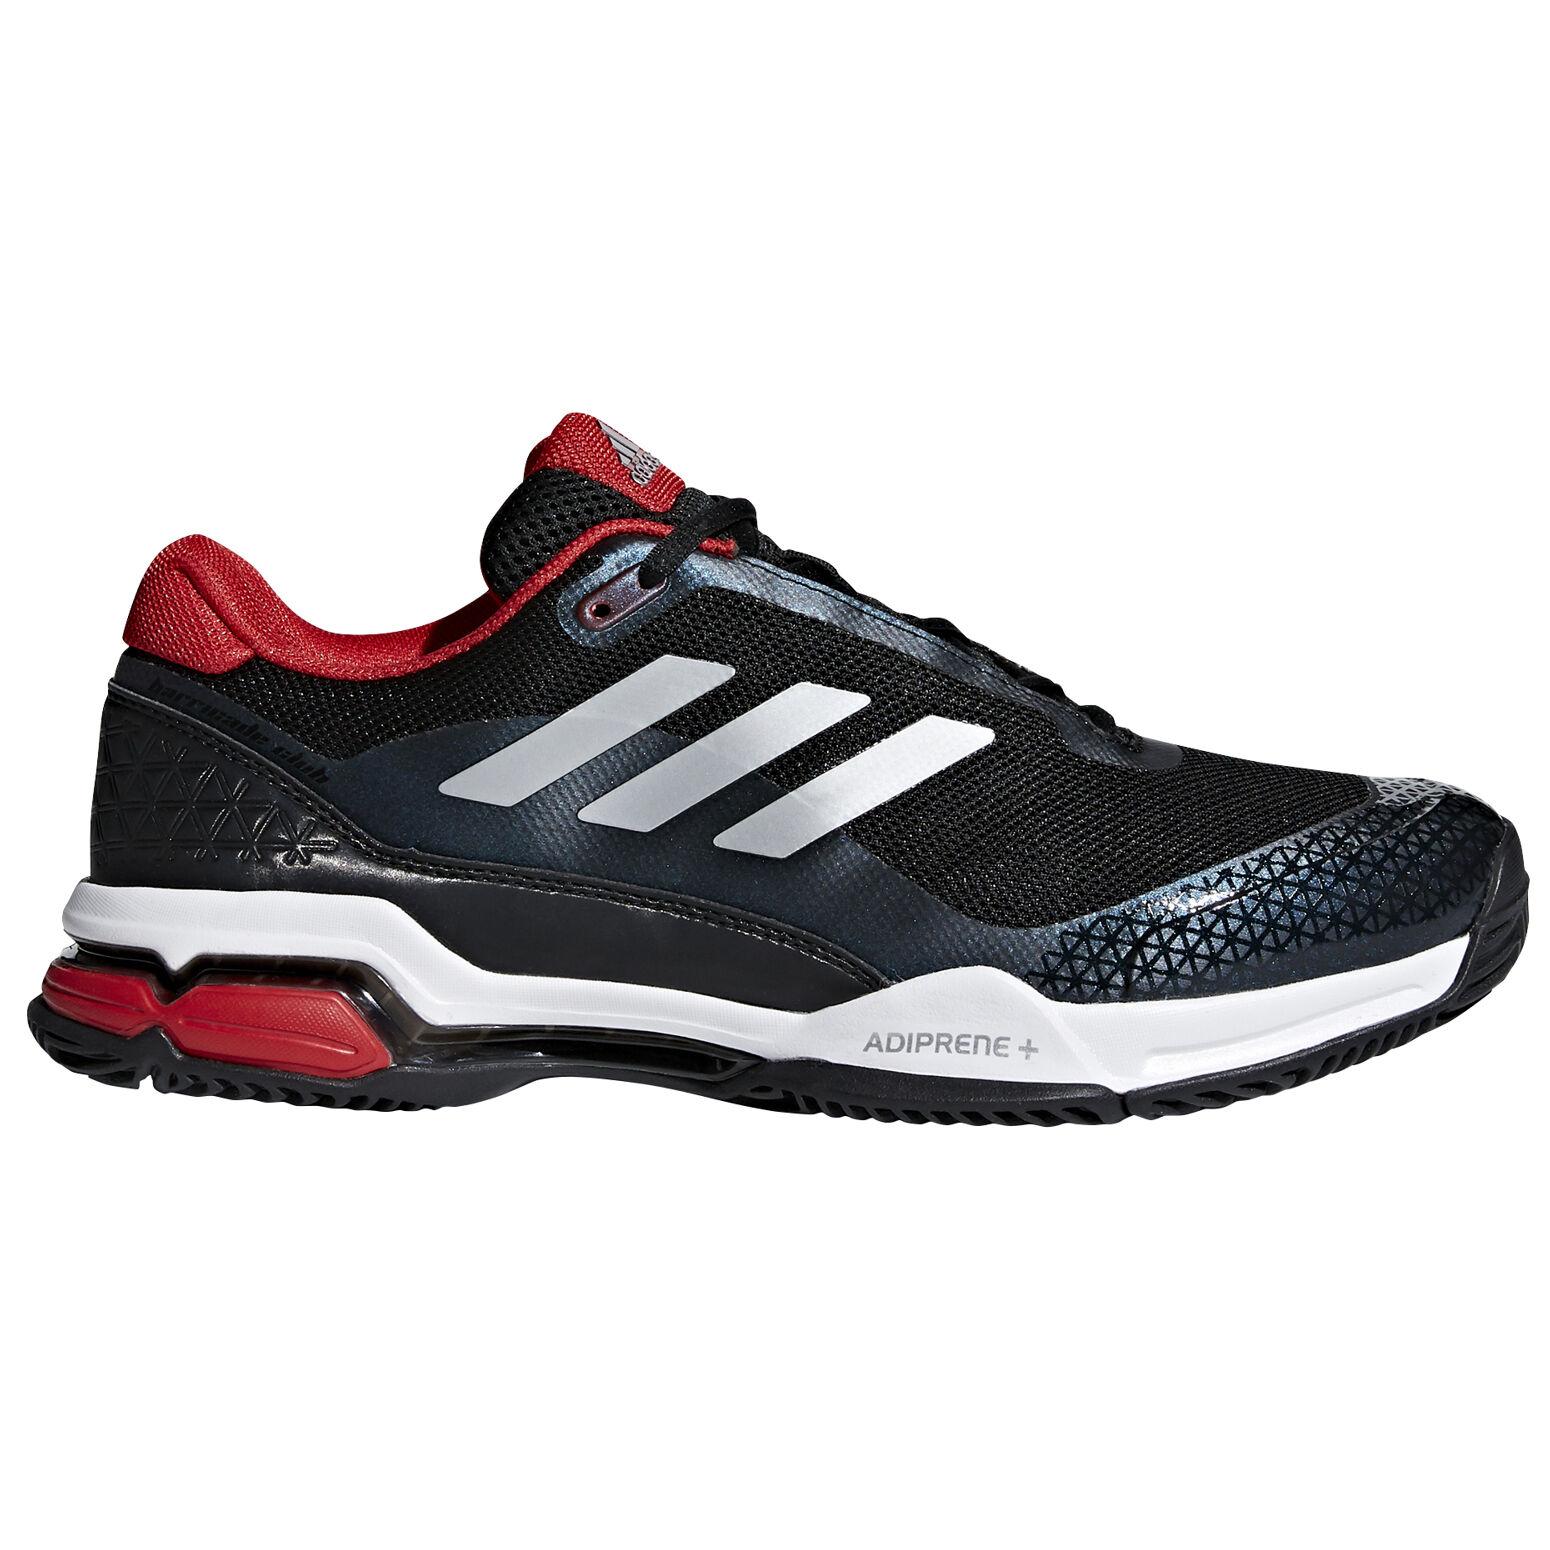 adidas Barricade Club Men's Tennis Shoe - Black/Red